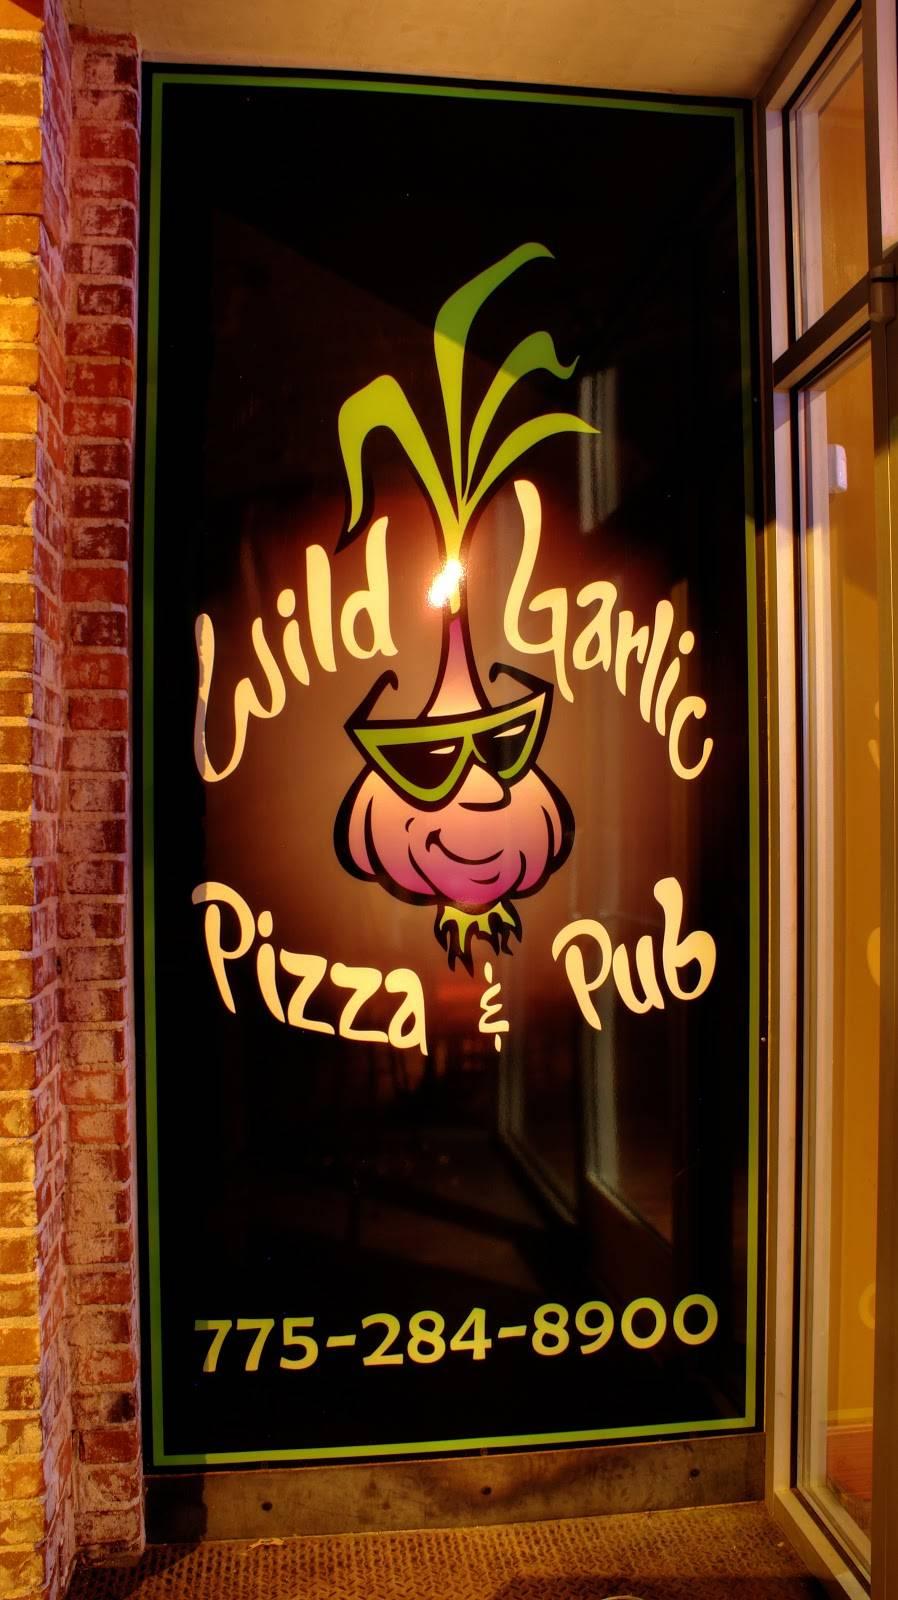 Wild Garlic Pizza & Pub - restaurant  | Photo 7 of 10 | Address: 670 Mt Rose St, Reno, NV 89509, USA | Phone: (775) 284-8900